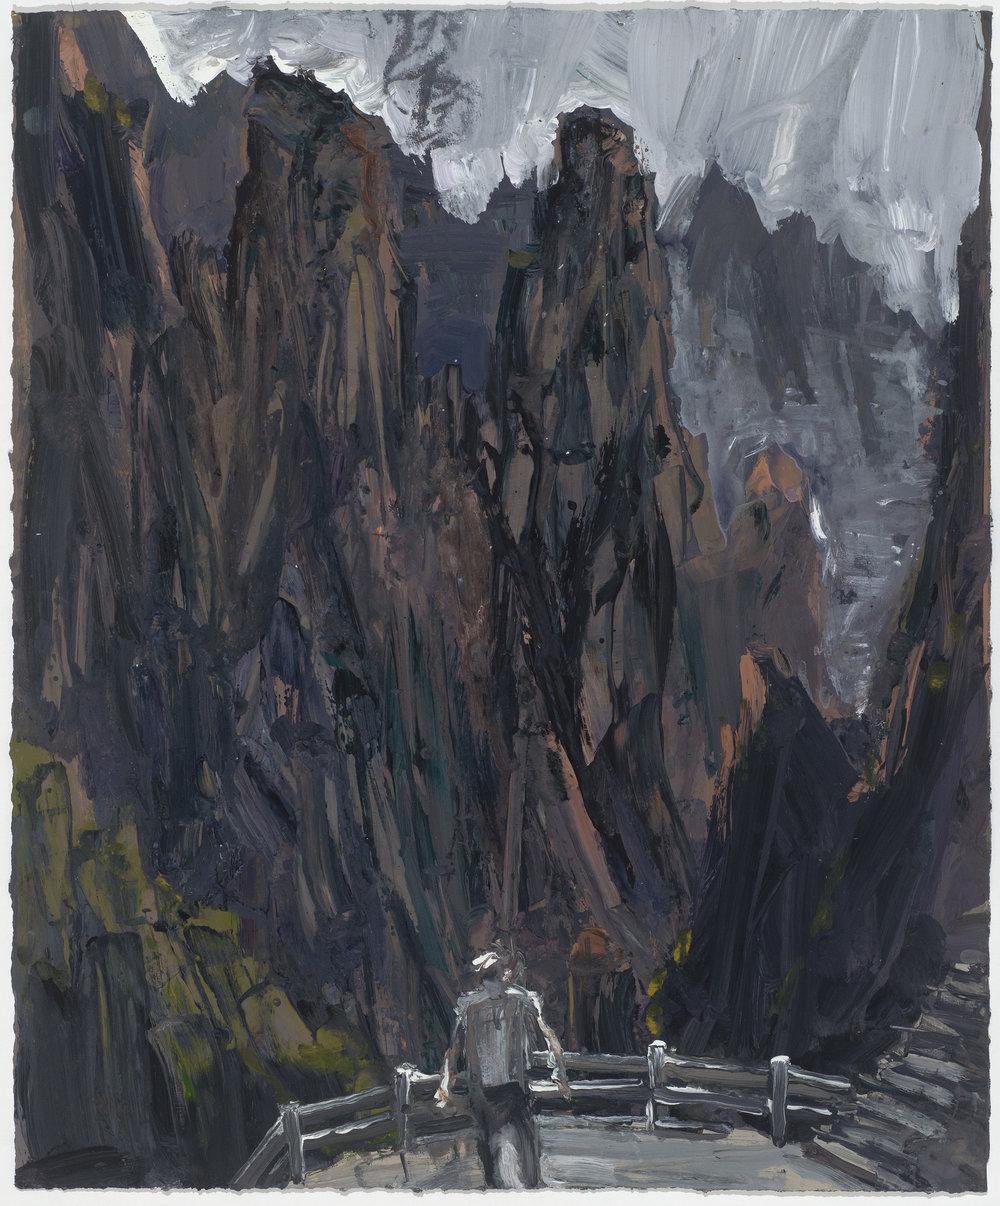 Dark mountains  暗黑的山嶺   Euan Macleod , 2016  Acrylic on paper, 80 x 66 cm, HKD 26,300 unframed